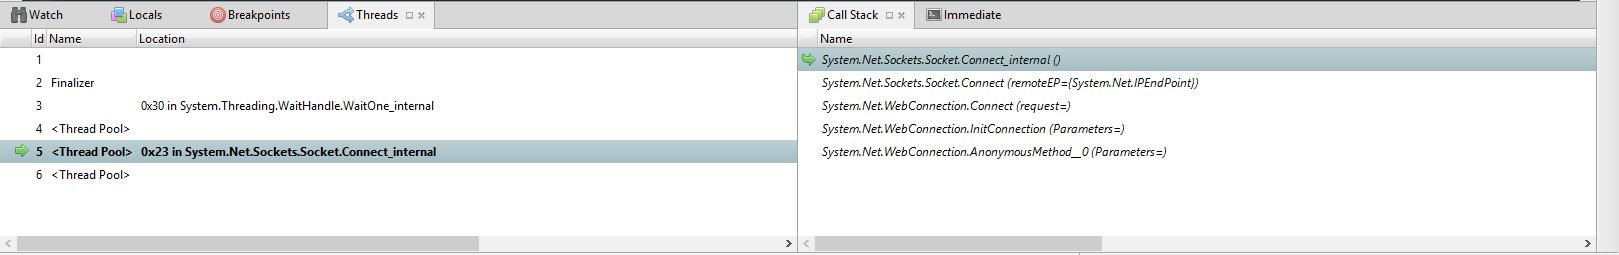 HttpClient PostAsync deadlock